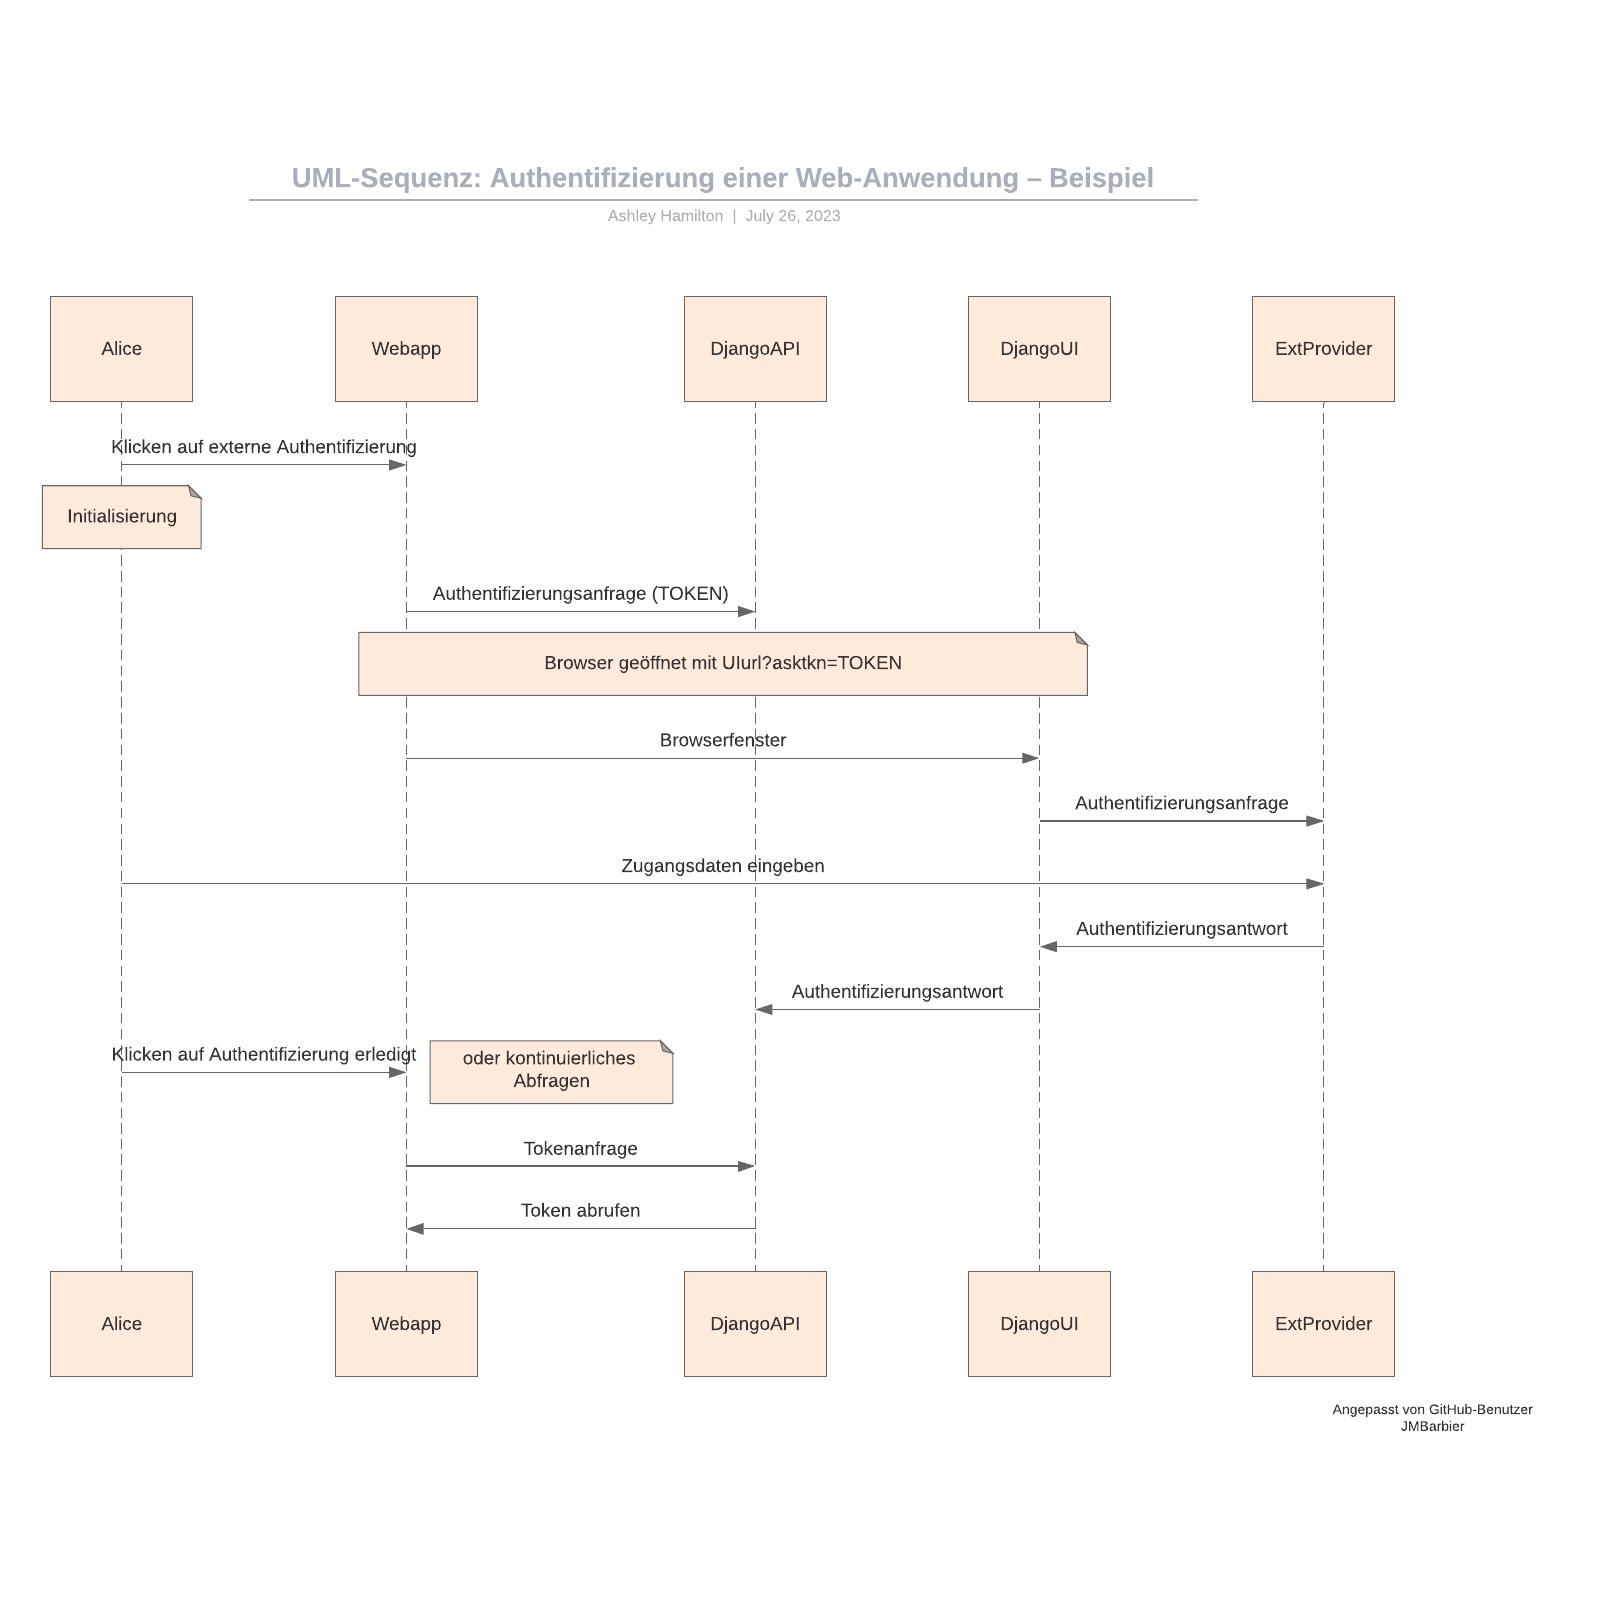 UML-Sequenz: Web-Anwendung Authentifizierung